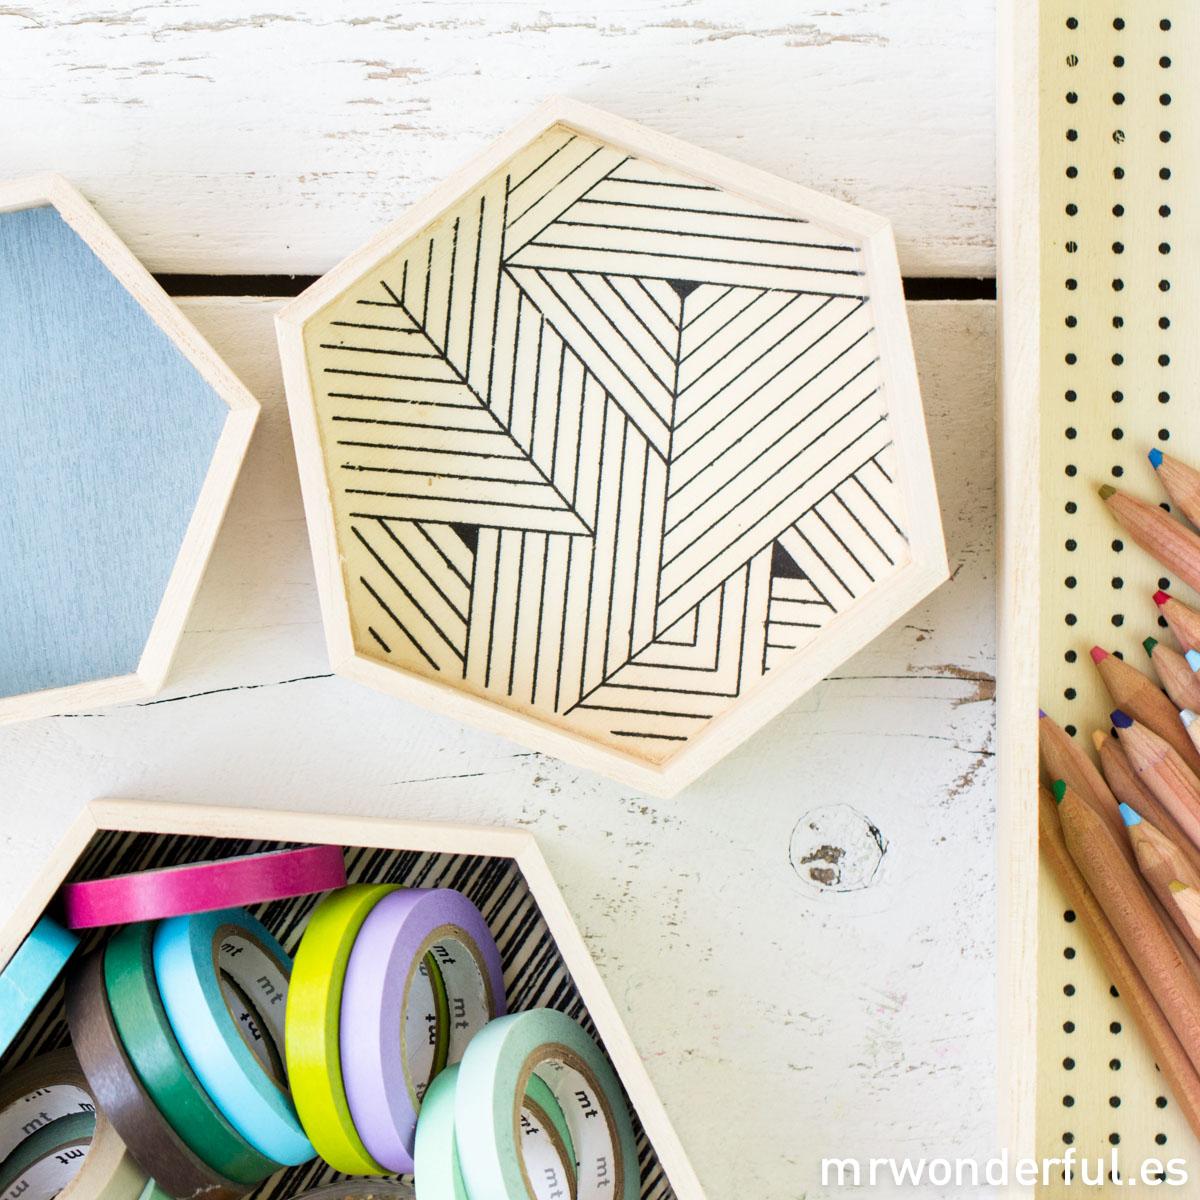 mrwonderful_SU0232_set-4-organizadores-madera-geometricos-15